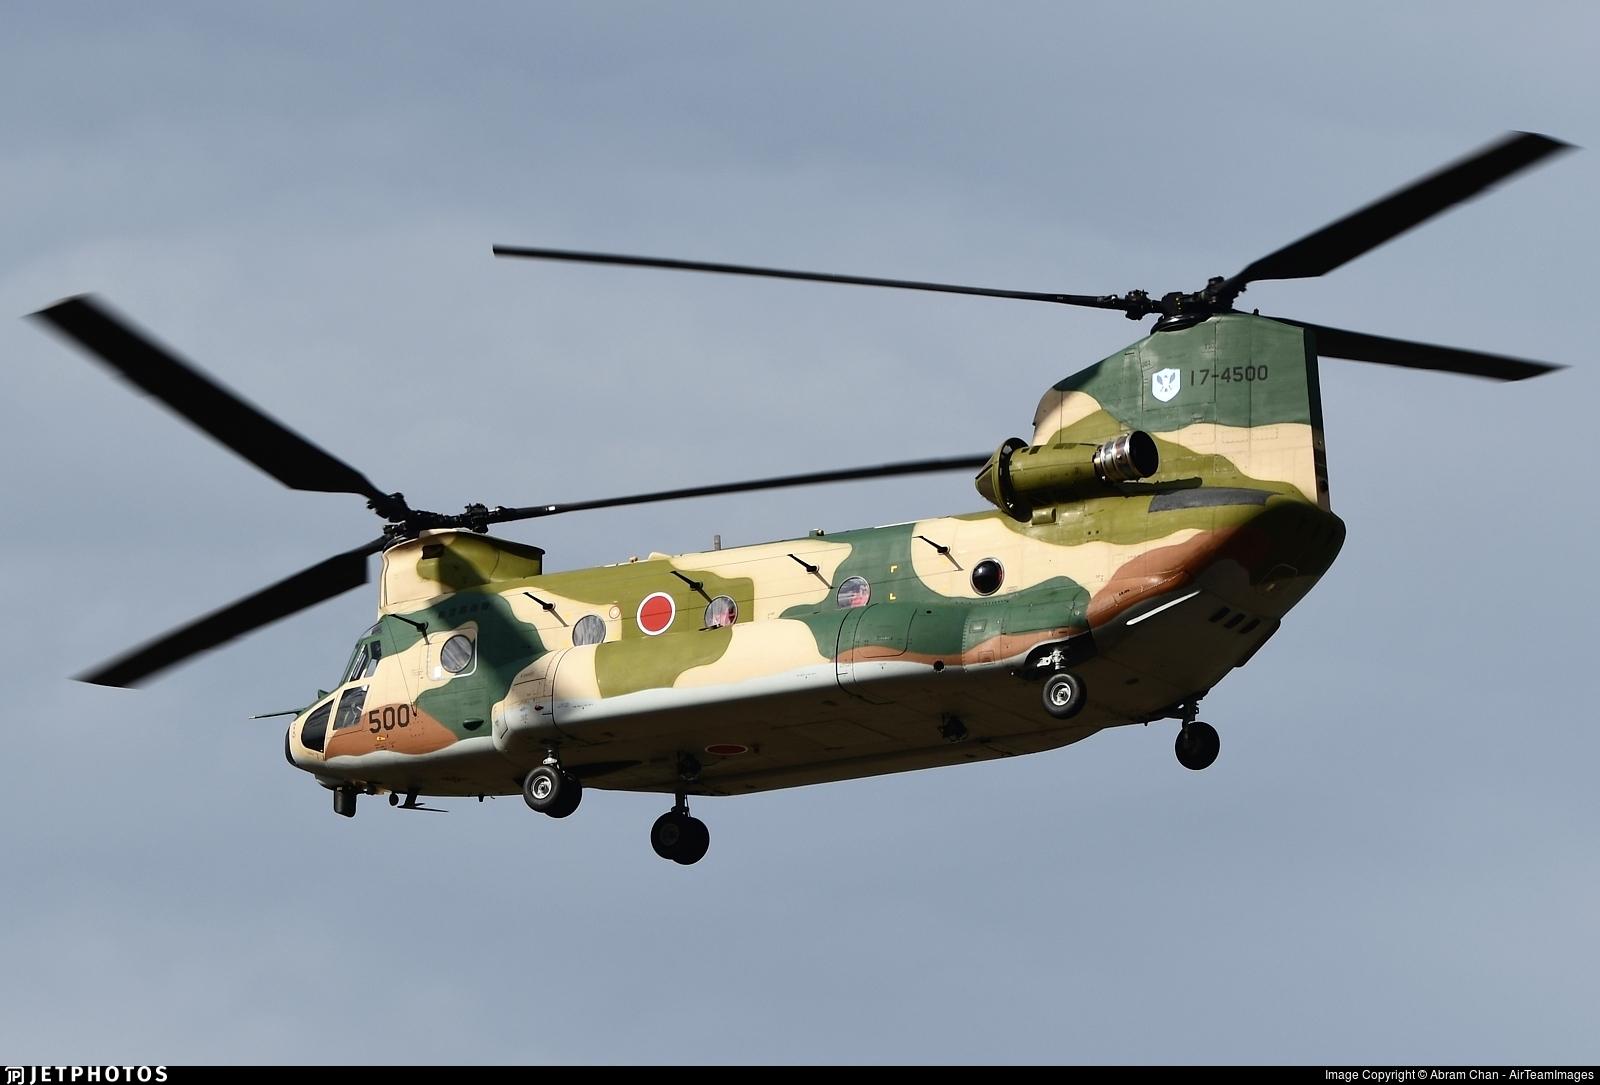 17-4500 - Kawasaki CH-47J Chinook - Japan - Air Self Defence Force (JASDF)